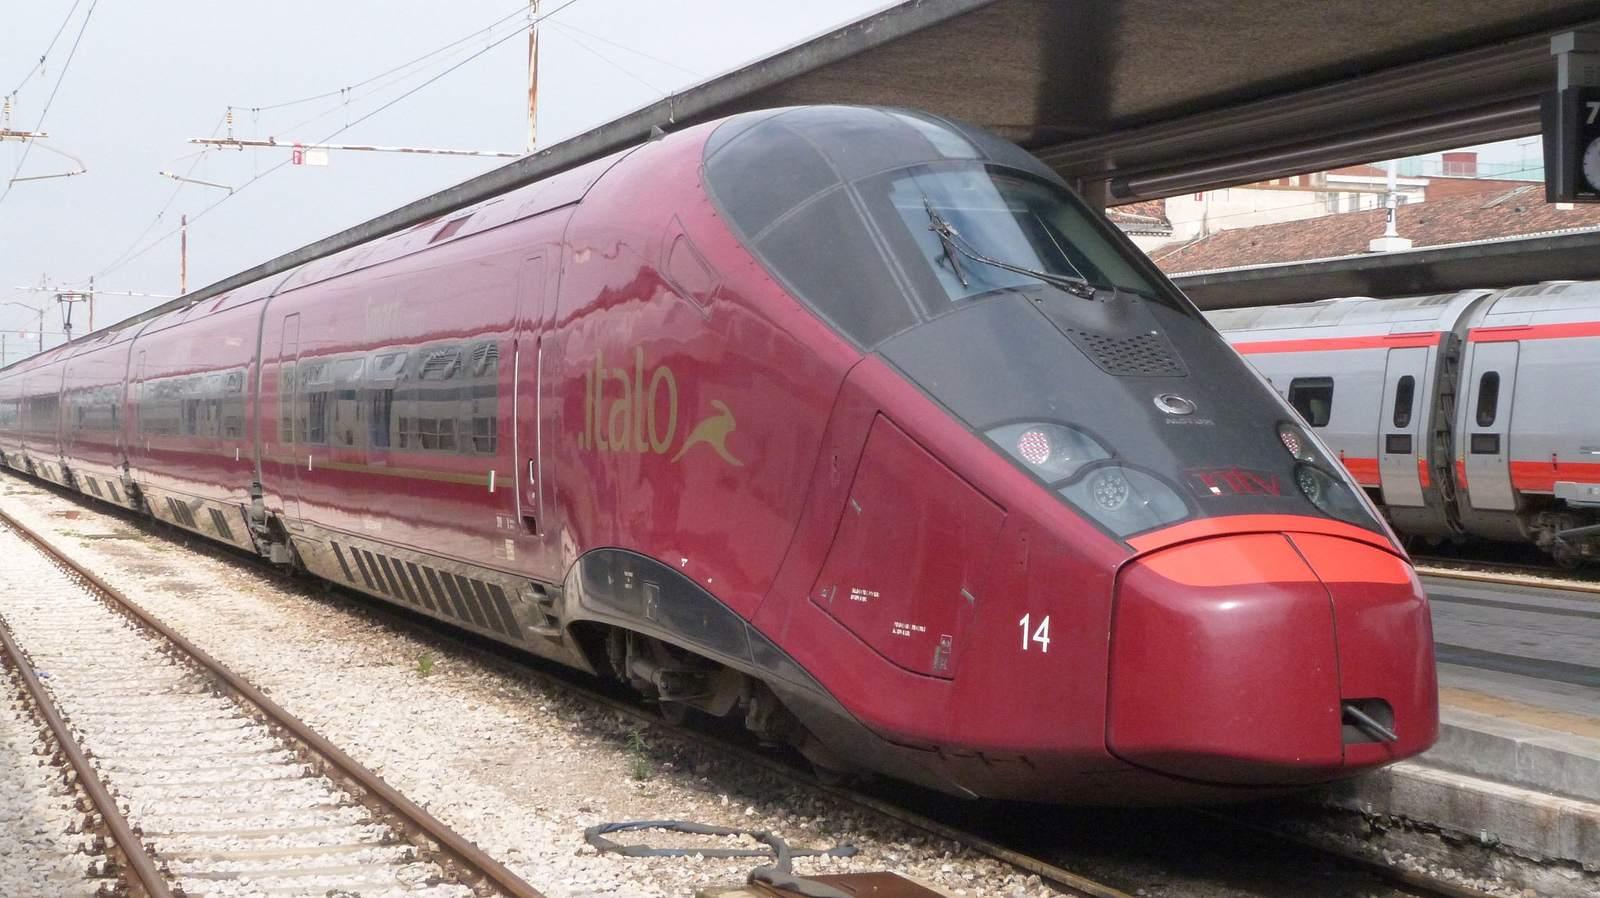 agv 5751 AGV Italo   The Most Modern Train in Europe